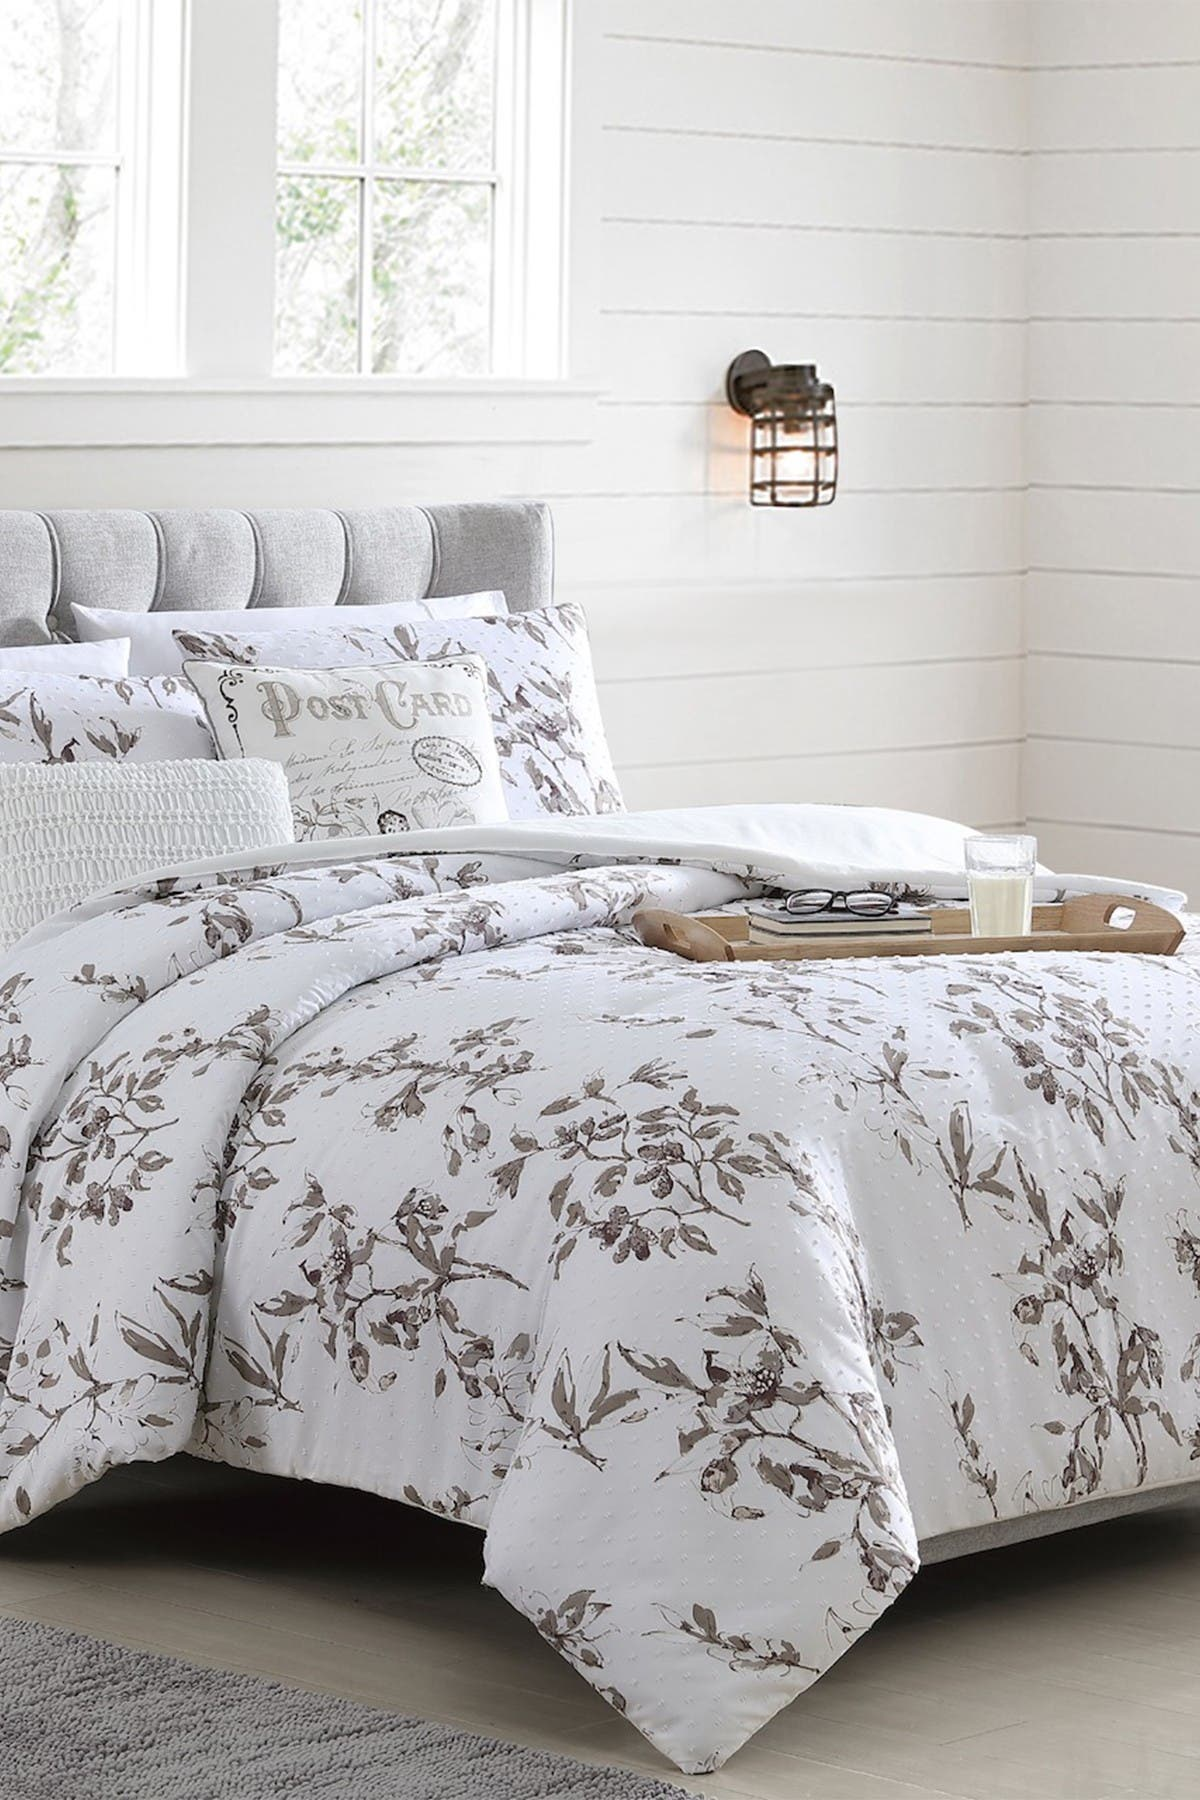 Modern Threads 5-Piece Jacquard Comforter Set - King at Nordstrom Rack